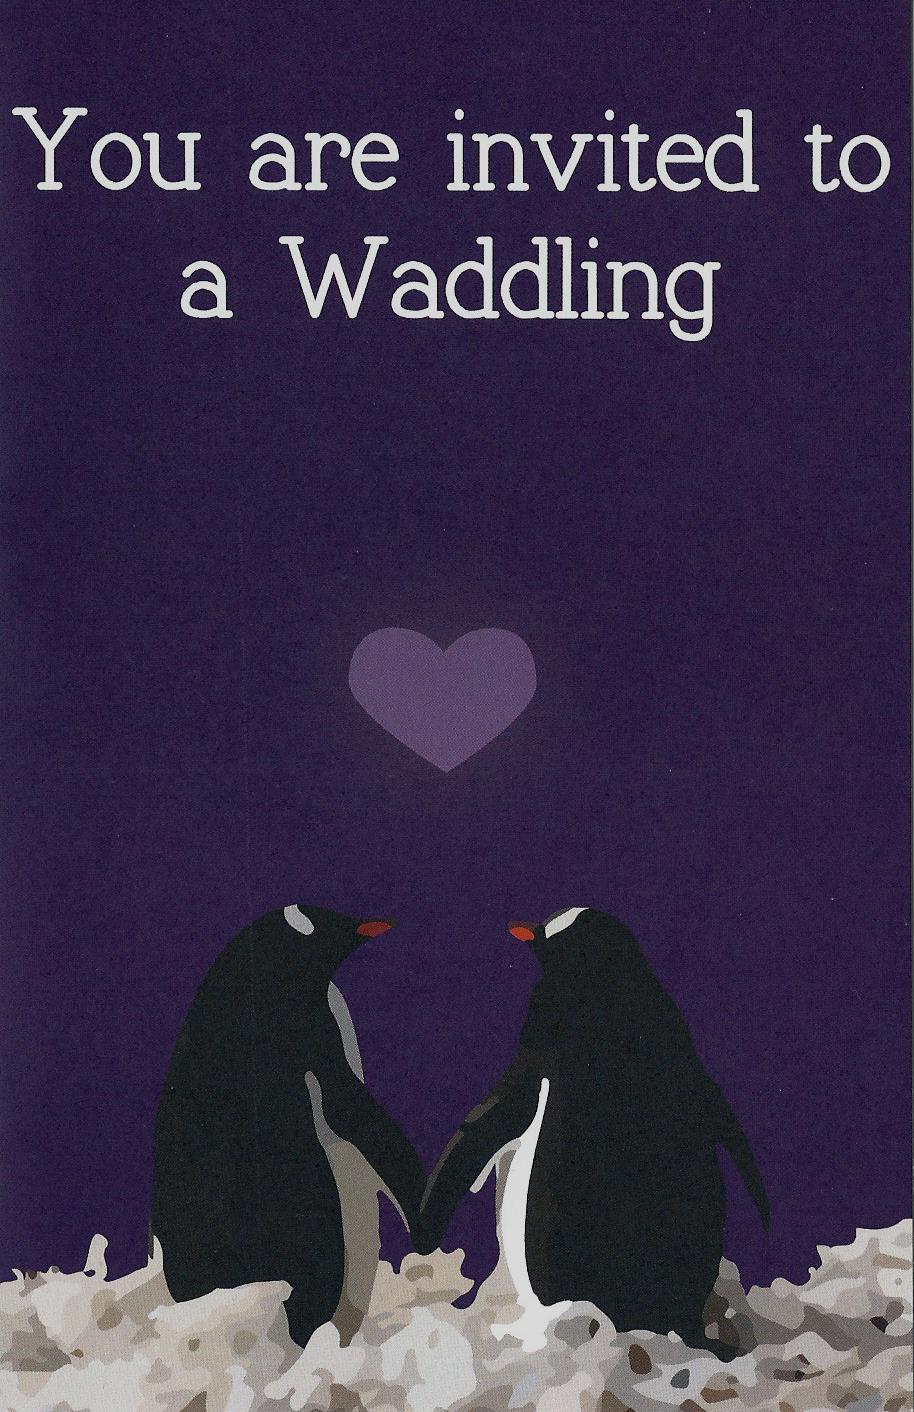 My wedding invitation design